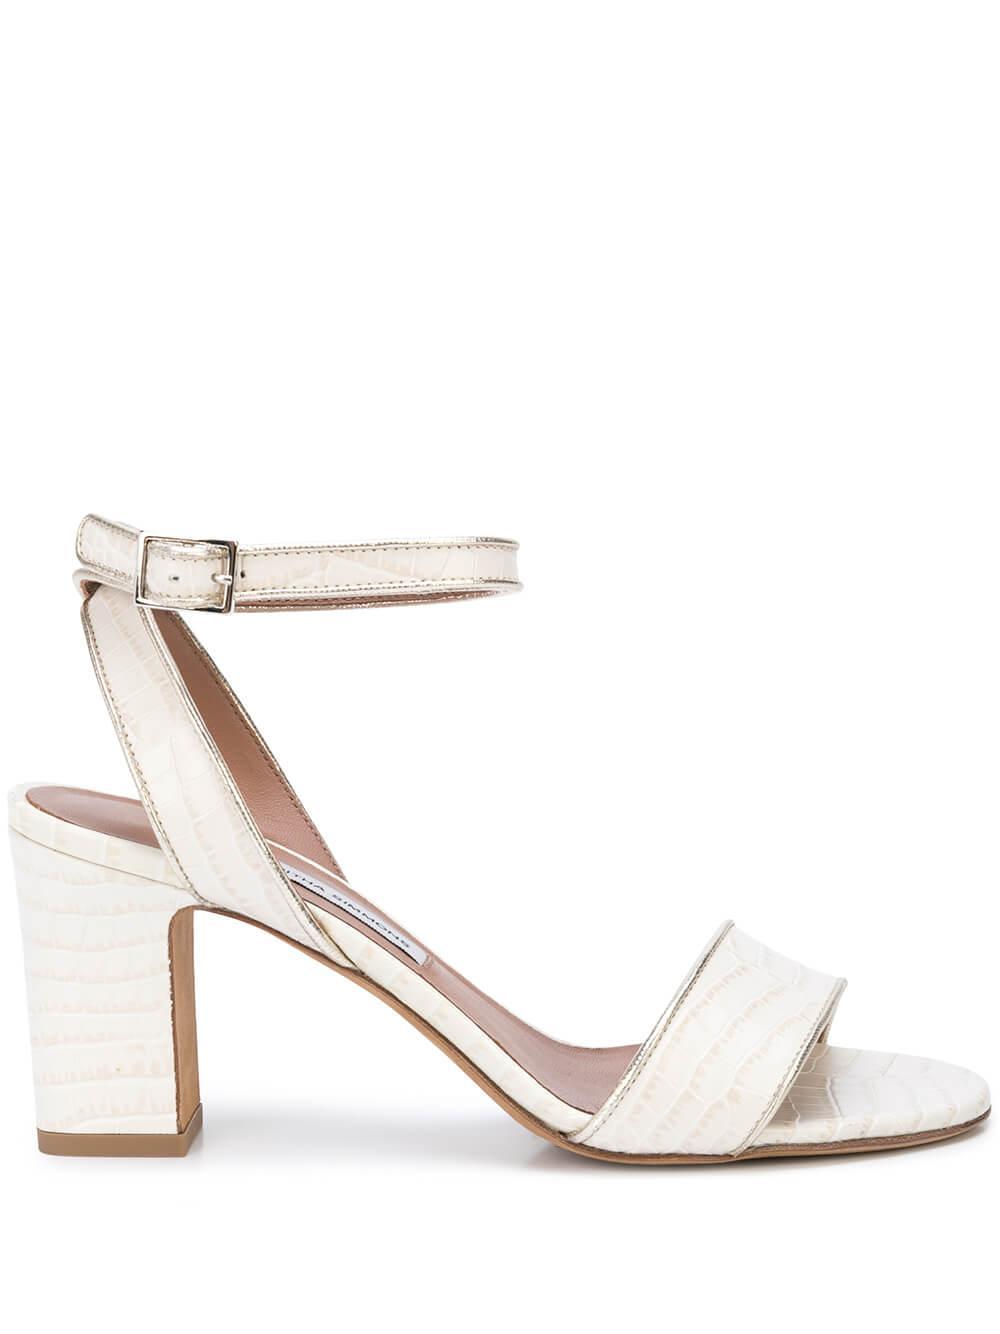 Leticia Croc 75MM Block Heel Sandal